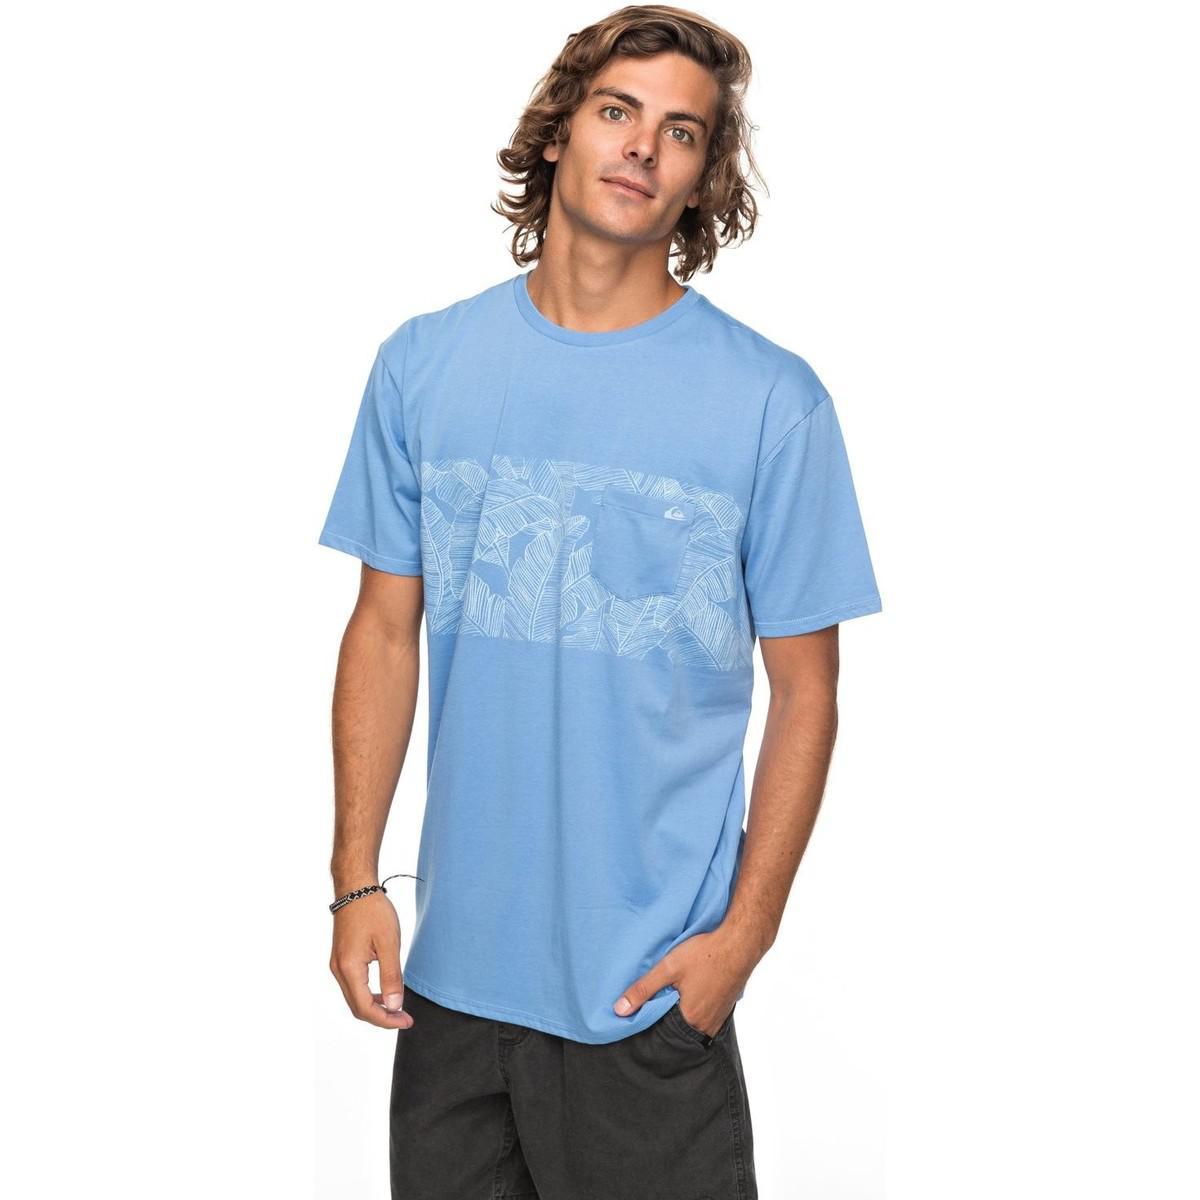 Quiksilver Mantra Right - Camiseta Con Bolsillo Eqyzt04790 Men s ... 3daea2b79d